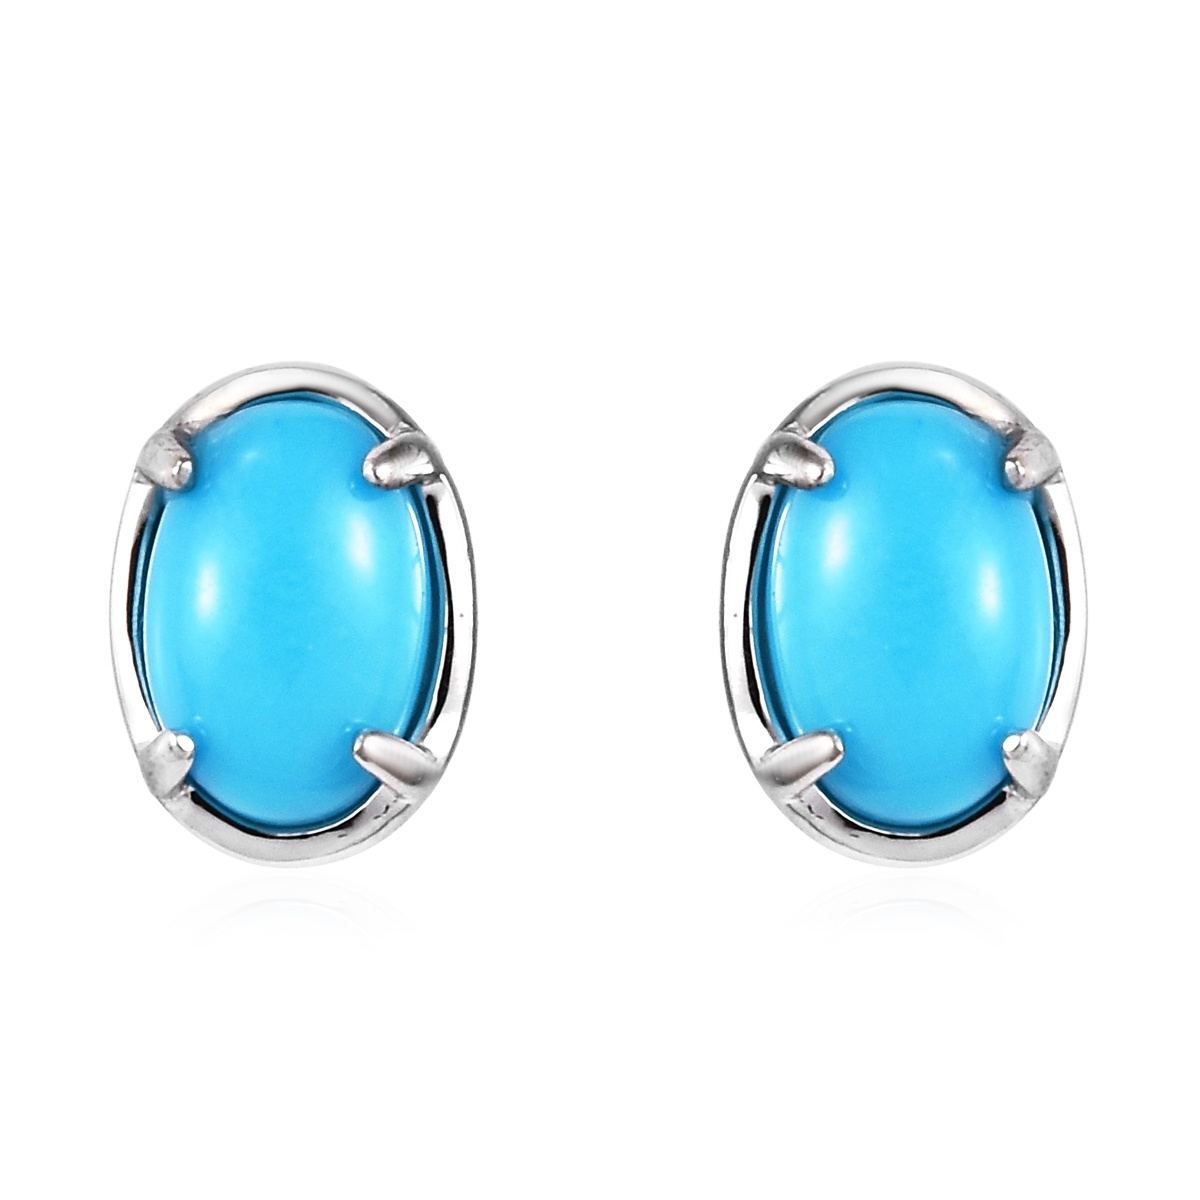 Arizona Sleeping Beauty Turquoise Stud Earrings in 14K White Gold 0.94 ctw